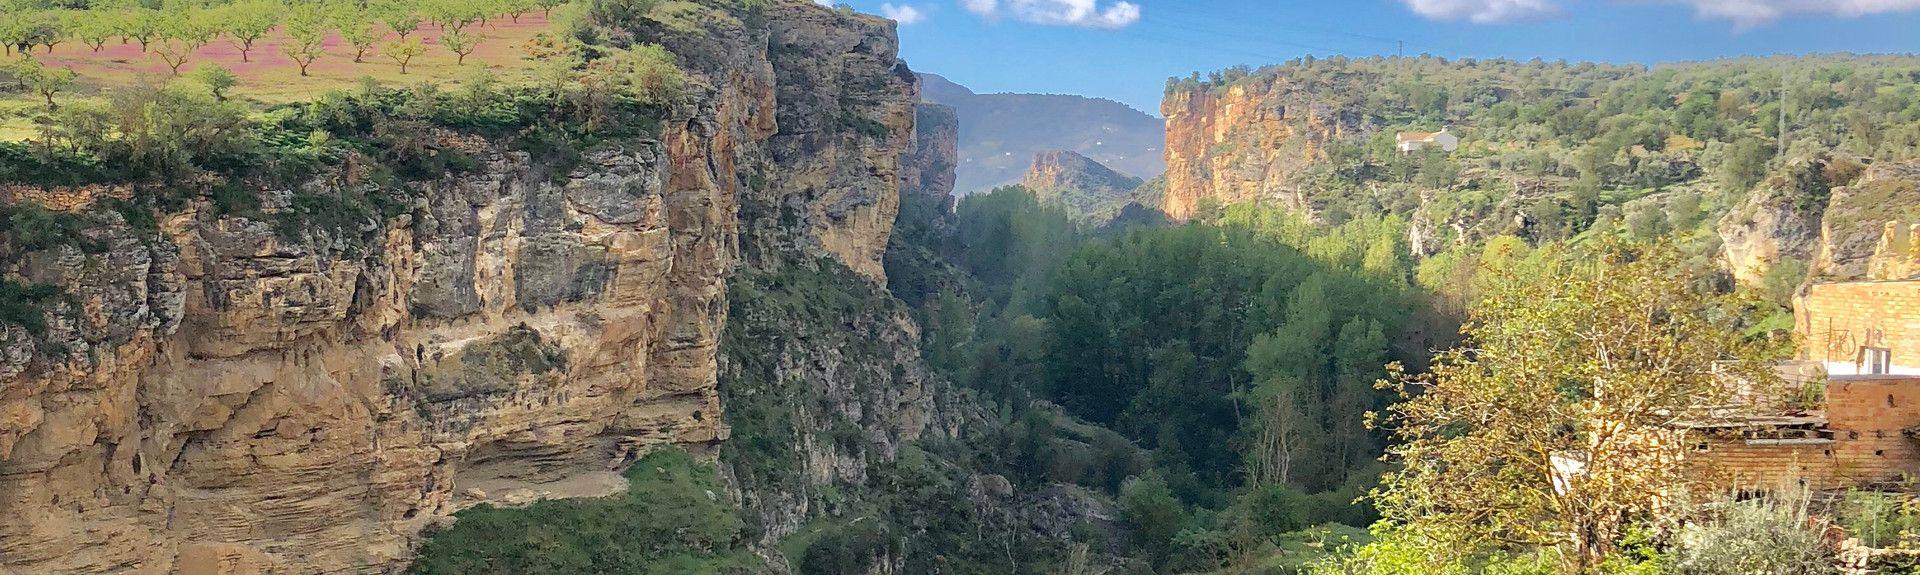 Veiga de Granada, Andaluzia, Espanha